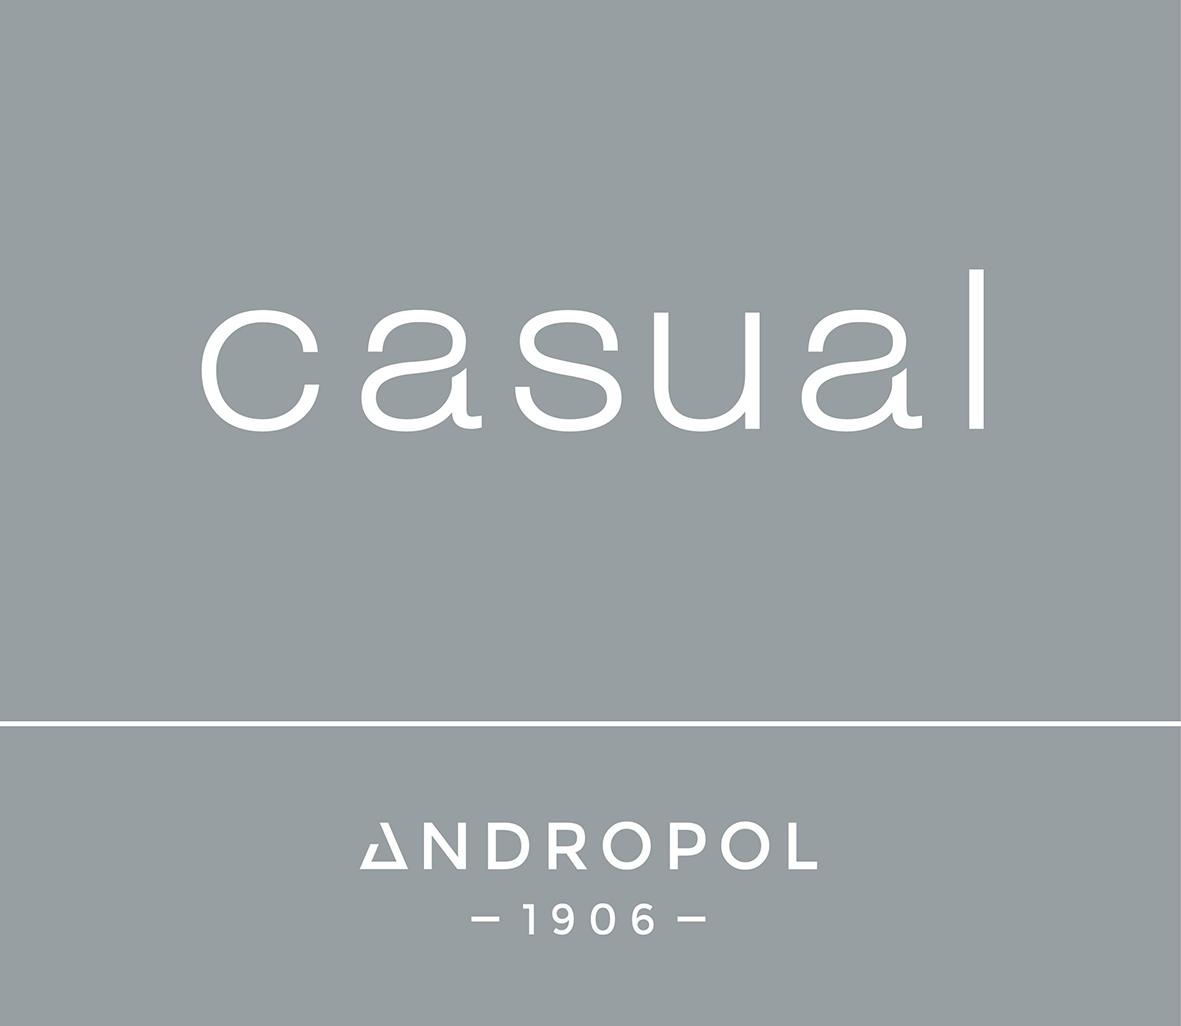 Casual - Andropol S.A. - Polski Producent Tkanin